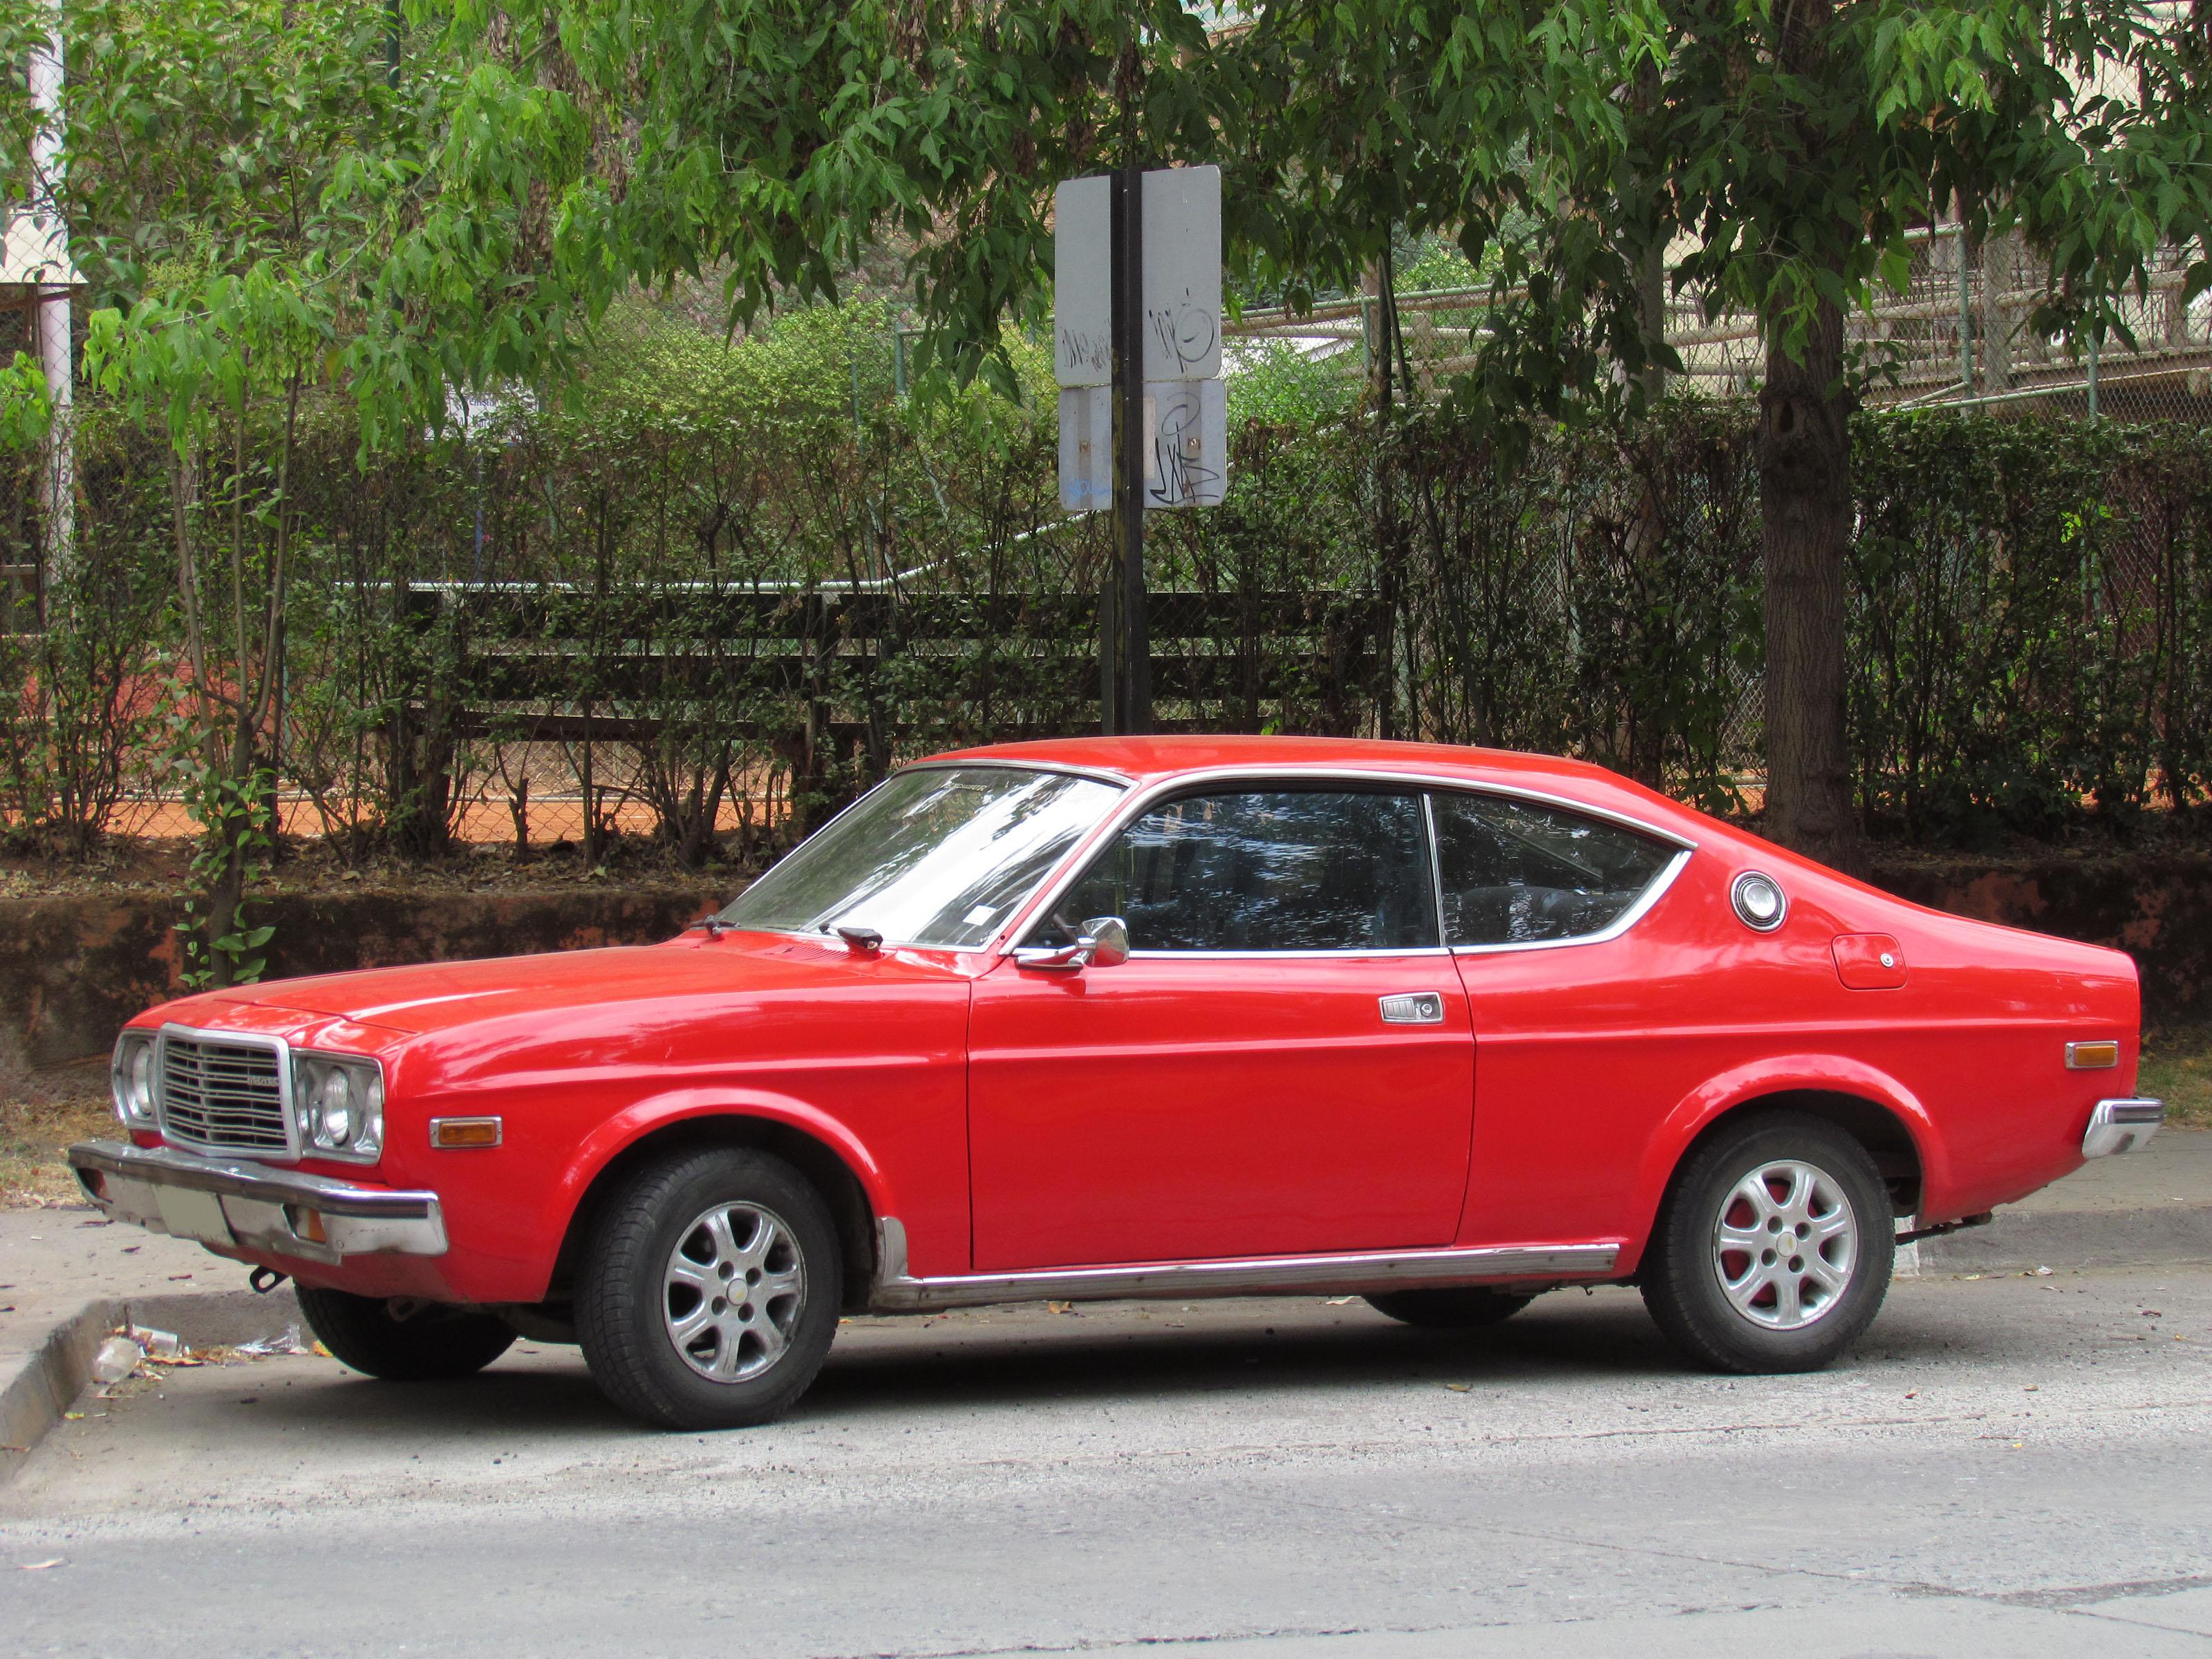 File:Mazda 929 Hardtop Coupe 1976 (13449318883).jpg